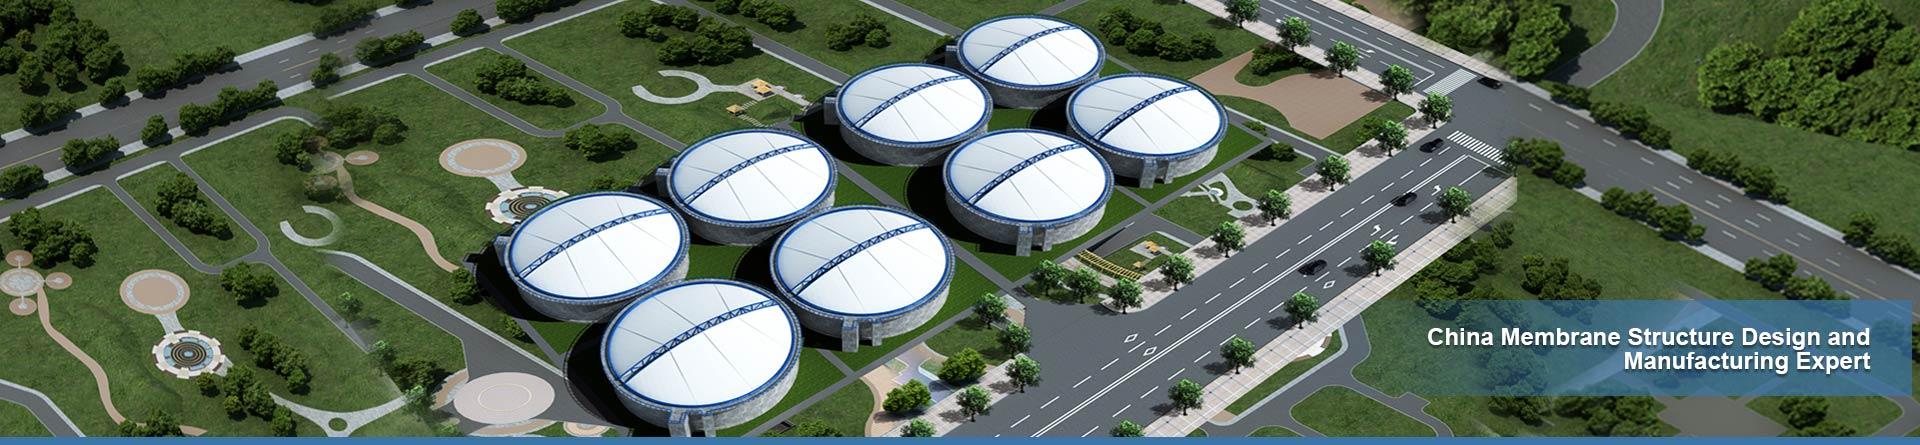 Sewage Membrane Structure